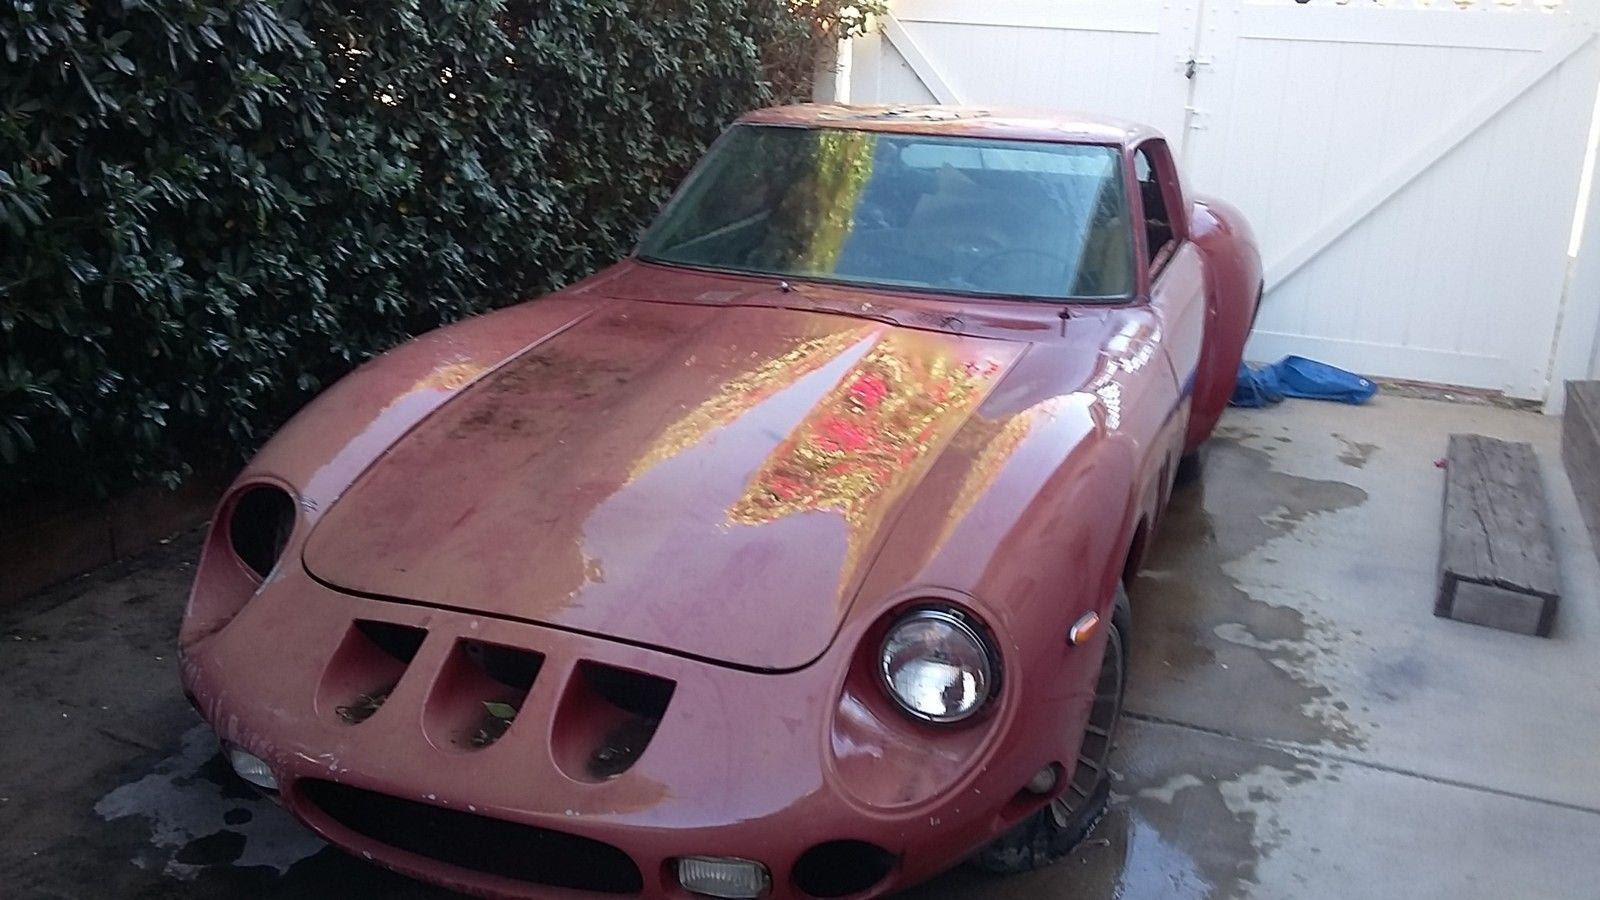 The 1973s 240z Datsun to Ferrari GTO kit for sale